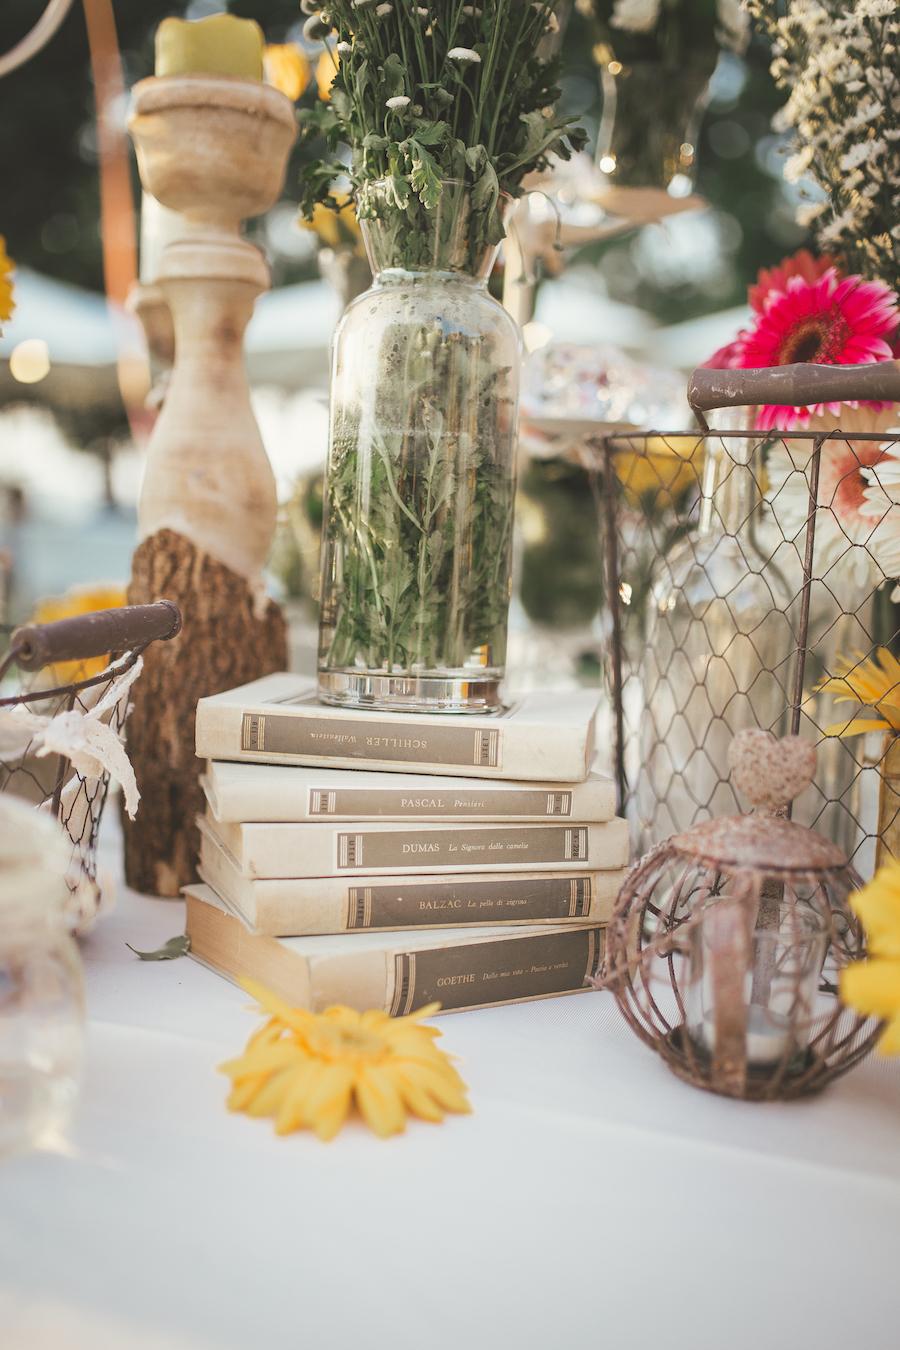 matrimonio-ecofriendly-a-caserta-gabriella-rotondi-wedding-wondeland-24